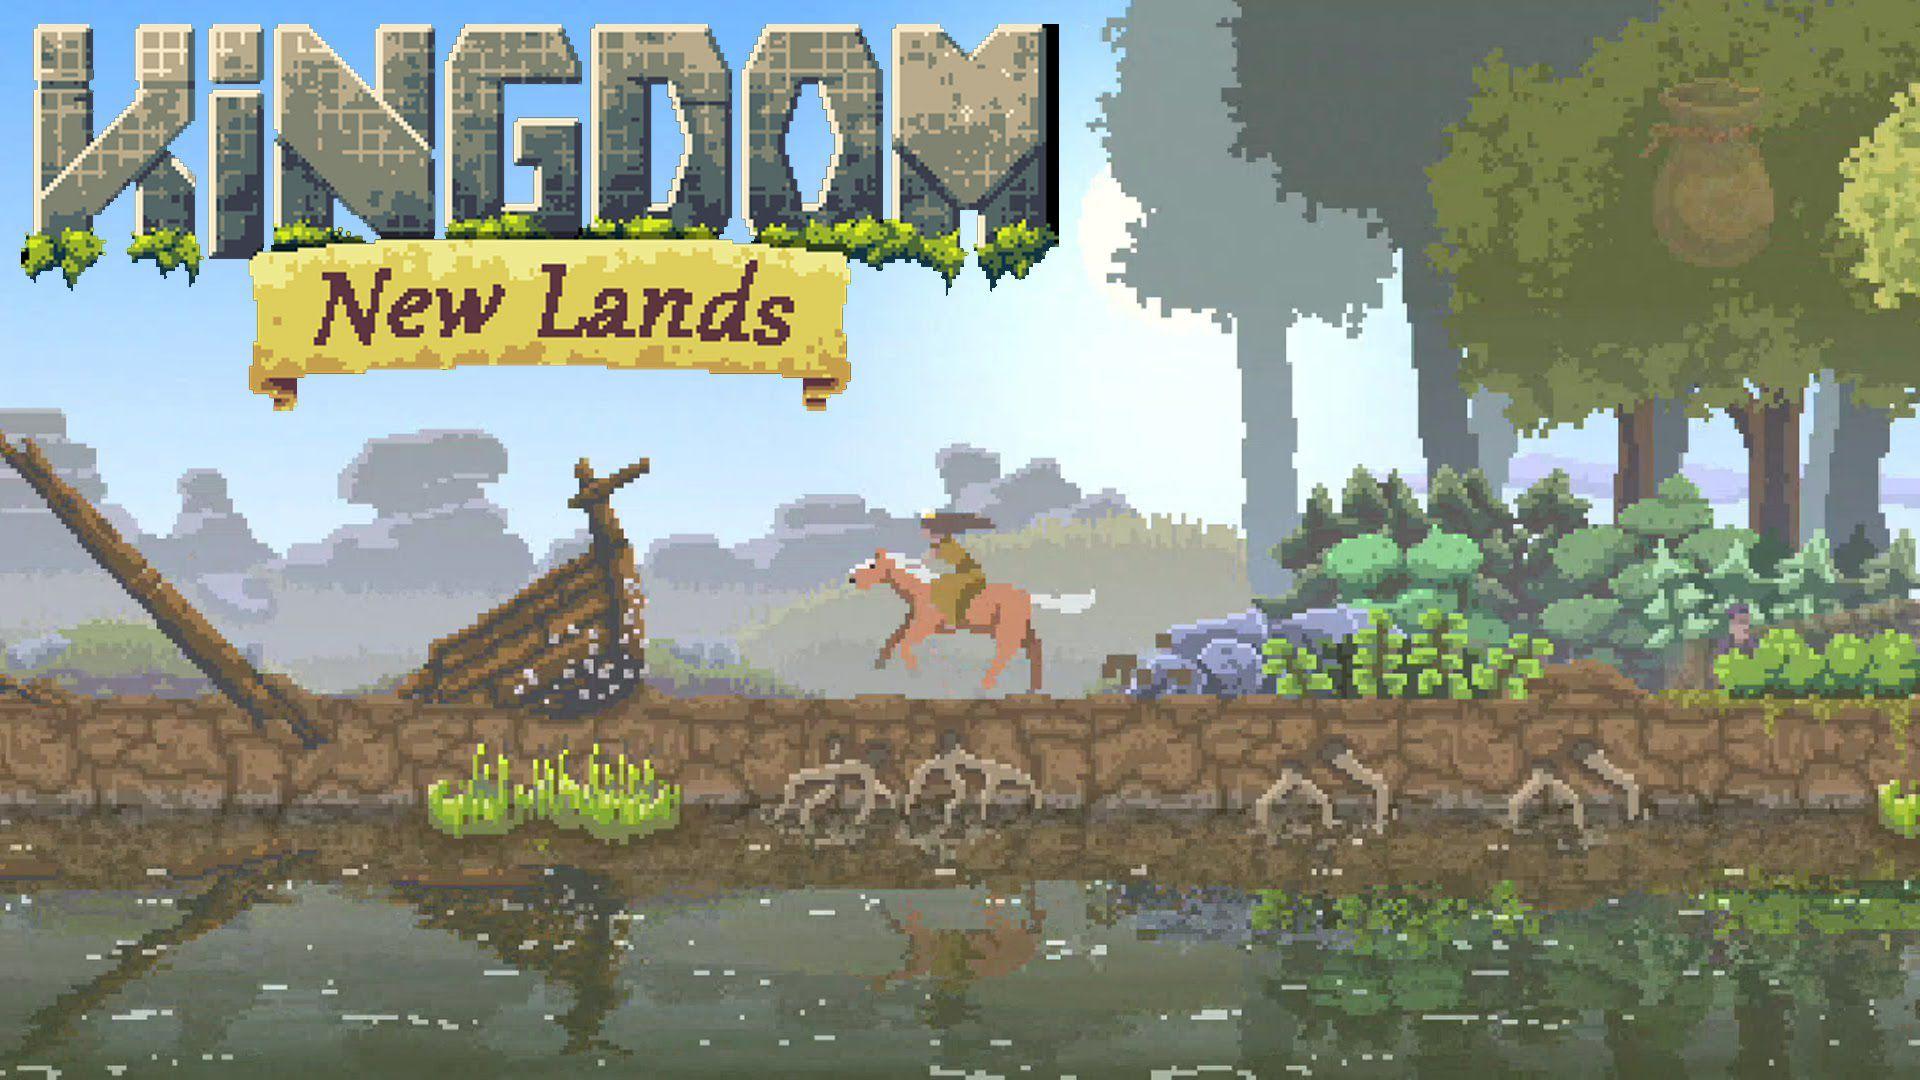 Kingdom new lands disponibile da oggi anche su playstation 4 for Cronaca galatina oggi